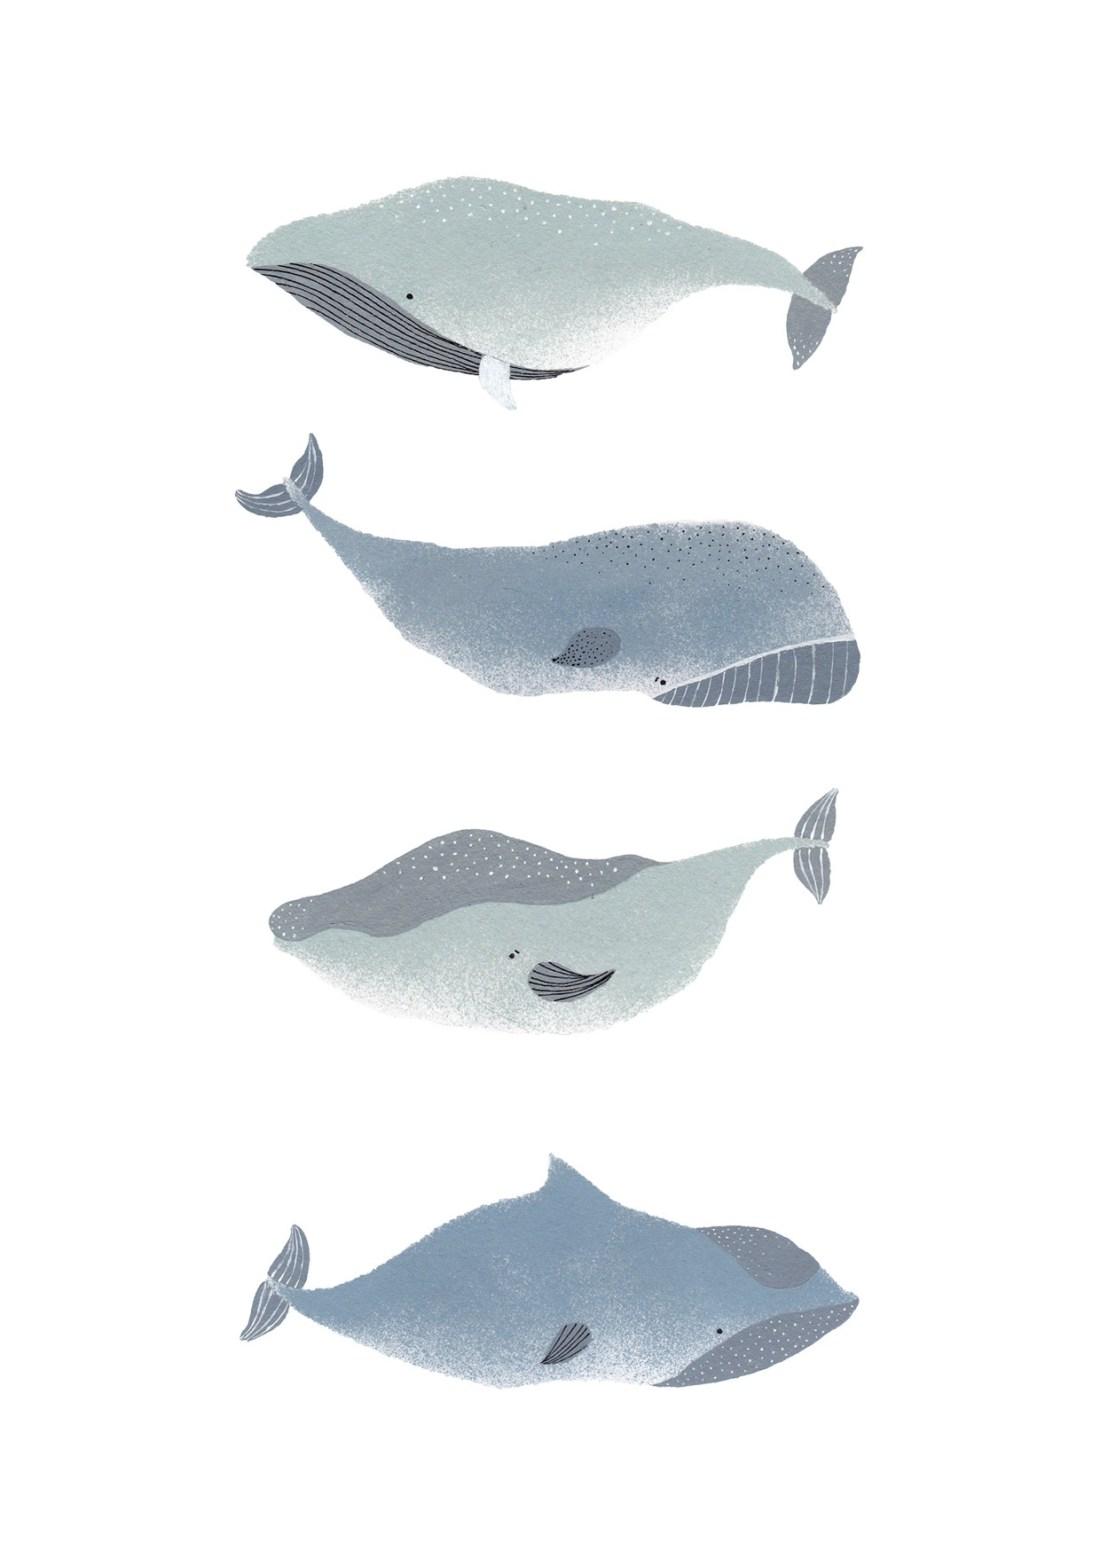 Wale-Walillustration-Blauwal